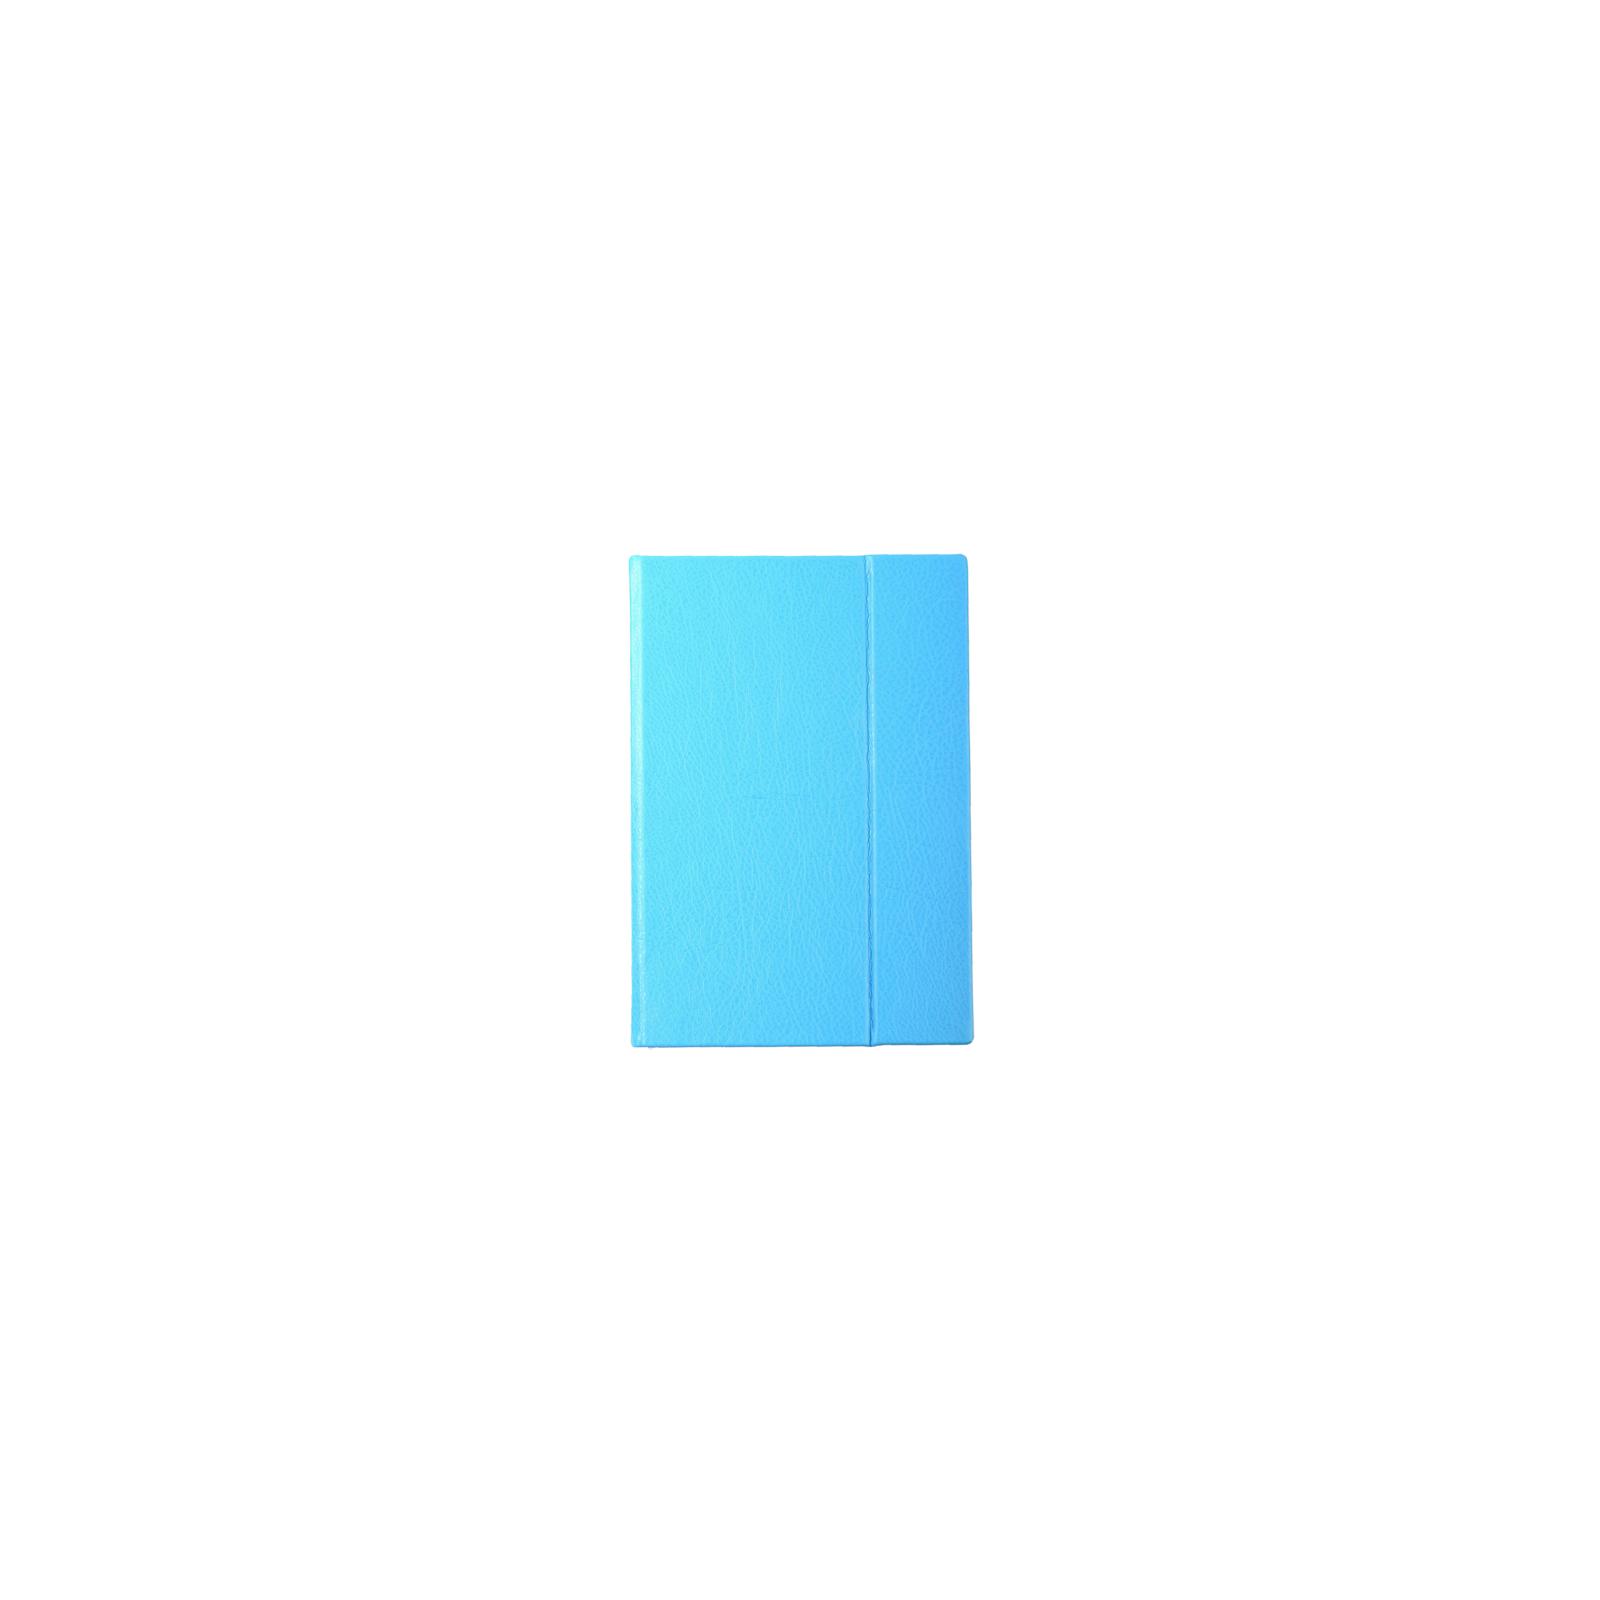 Чехол для планшета Vento 9.7 Desire Bright -blue изображение 2